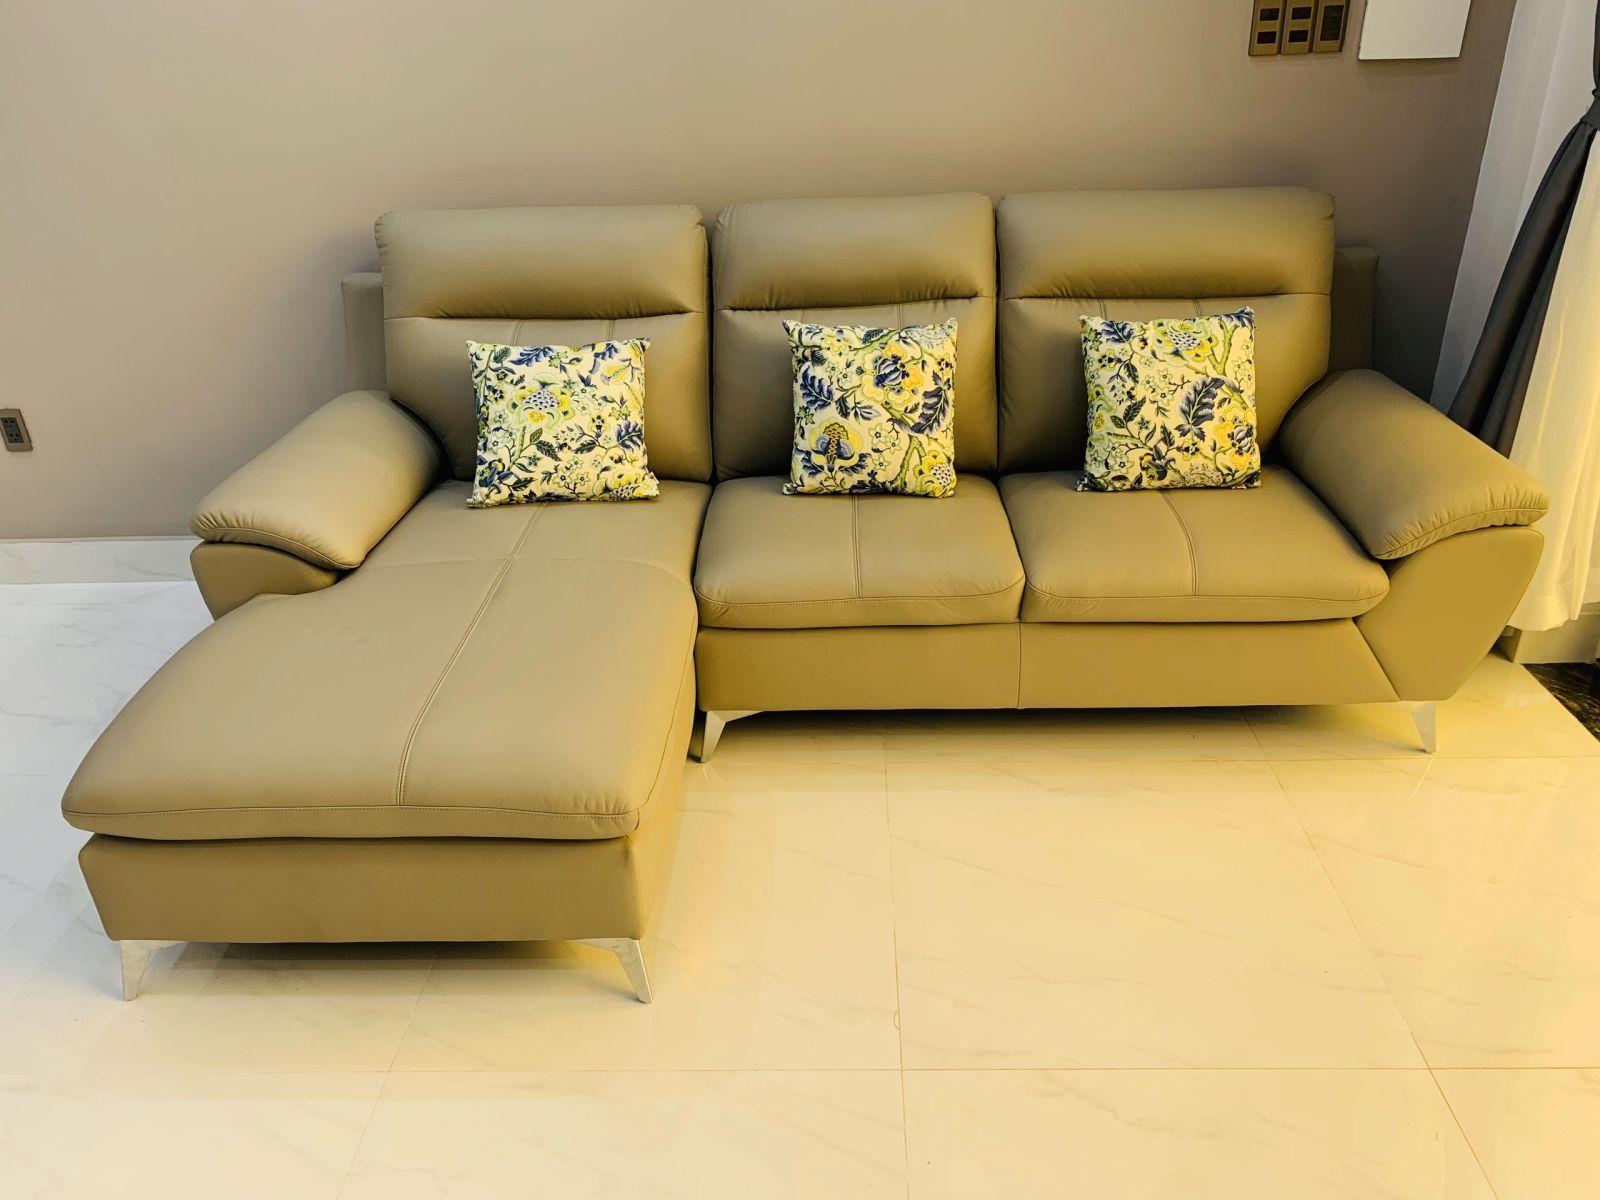 sofa da bò ý